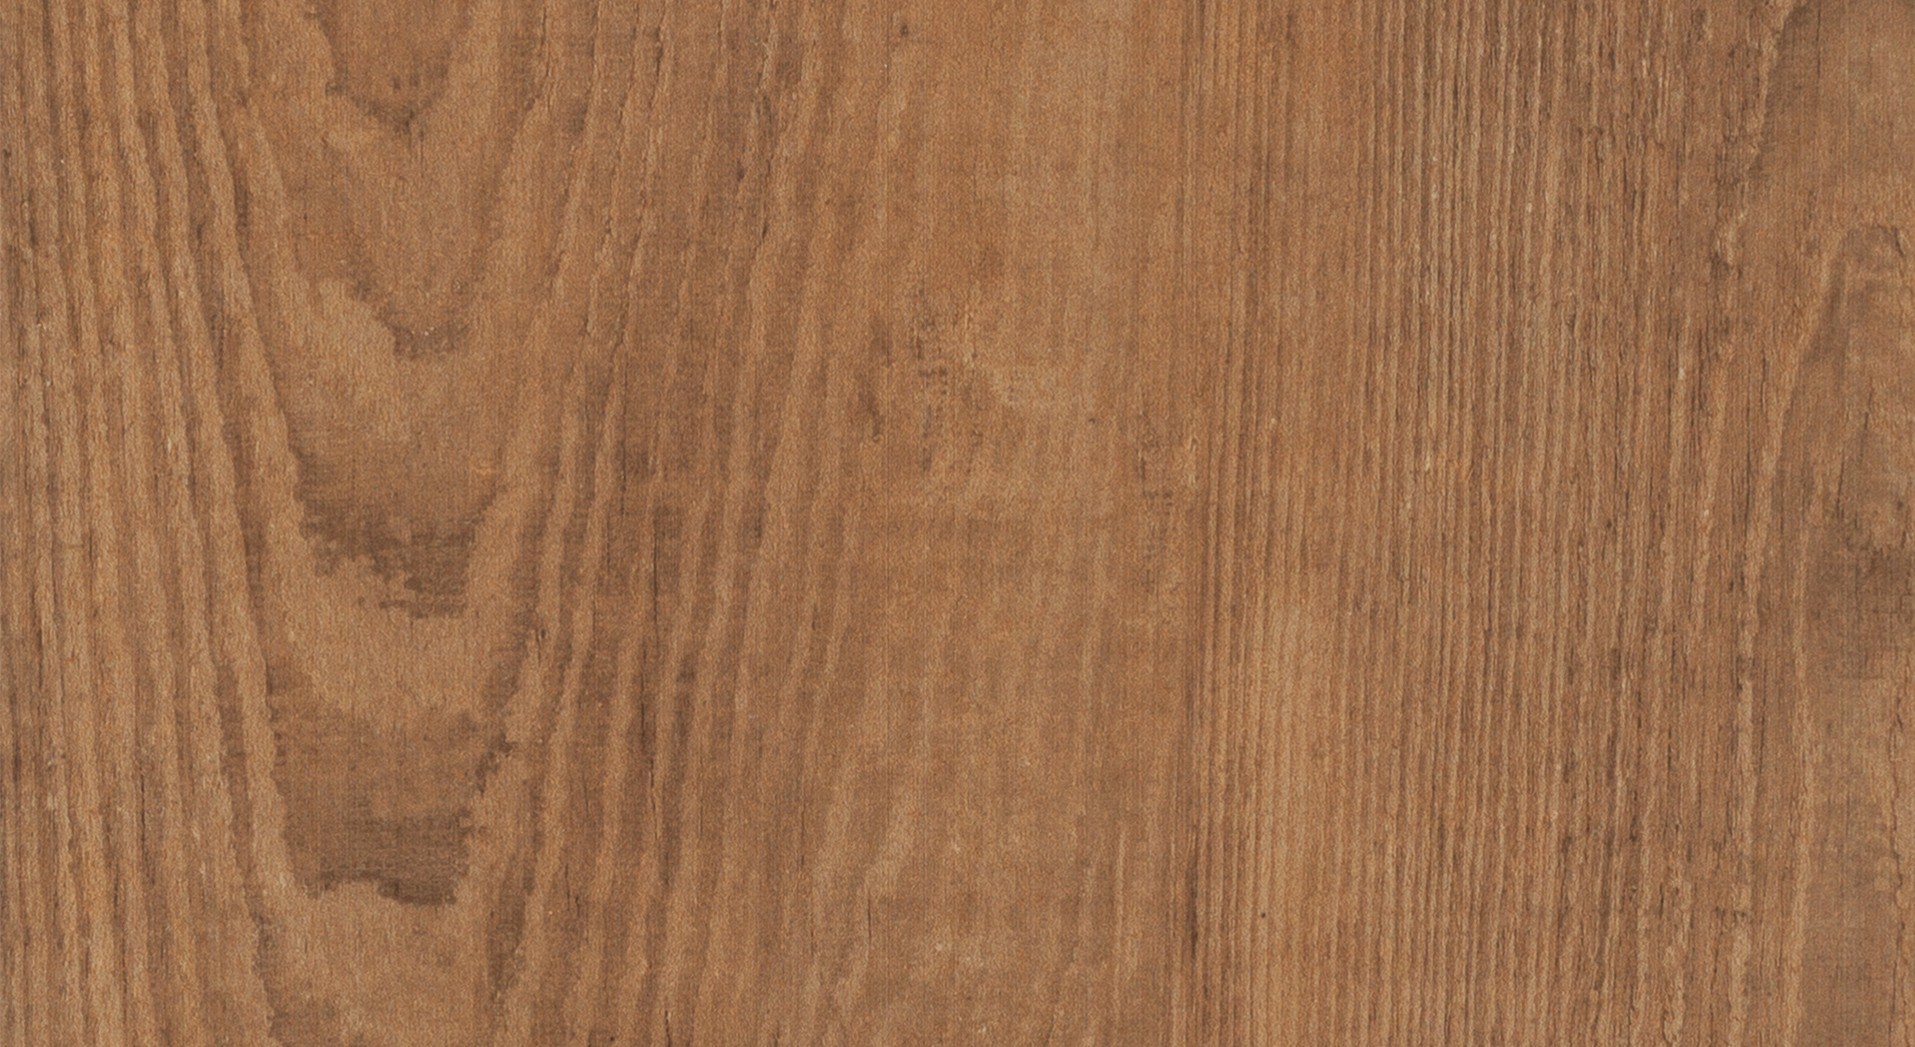 My Wood